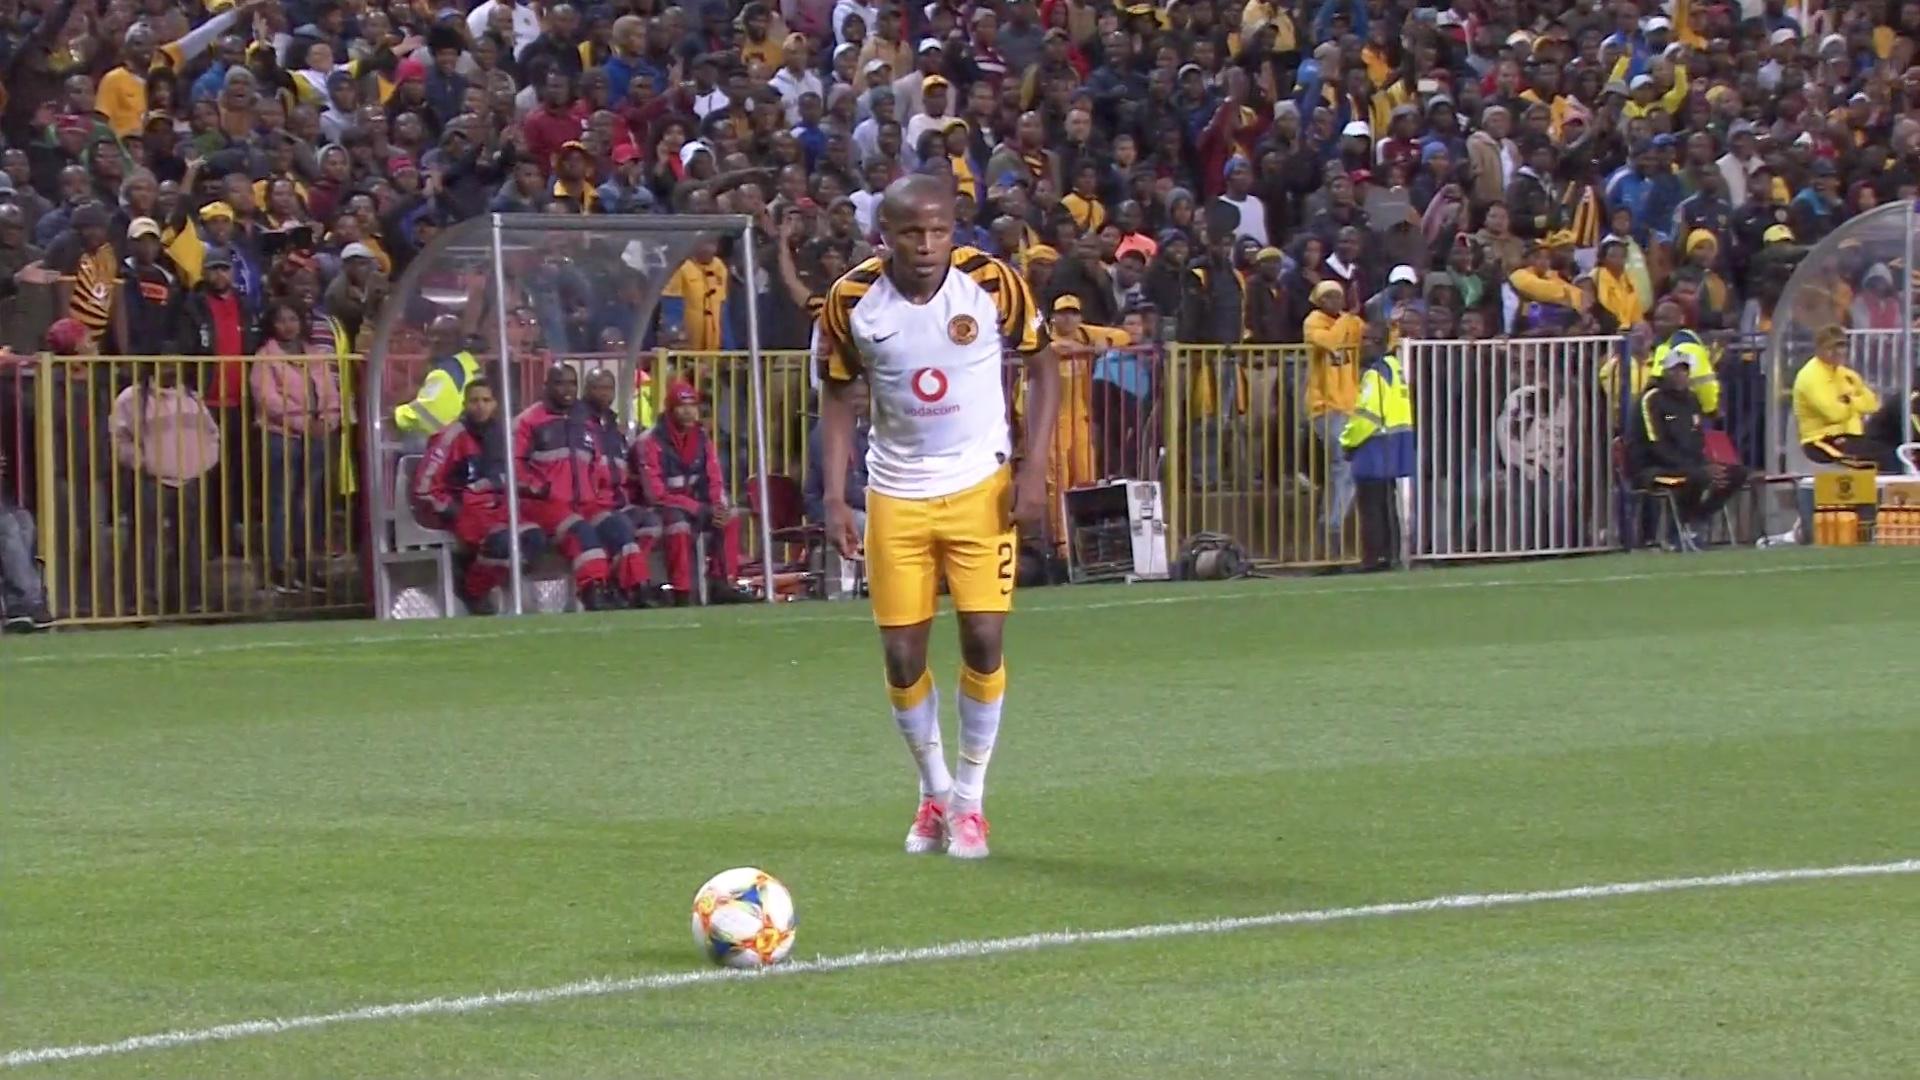 Absa Premiership 2019/20 | Cape Town City v Kaizer Chiefs | Chiefs equalising goal